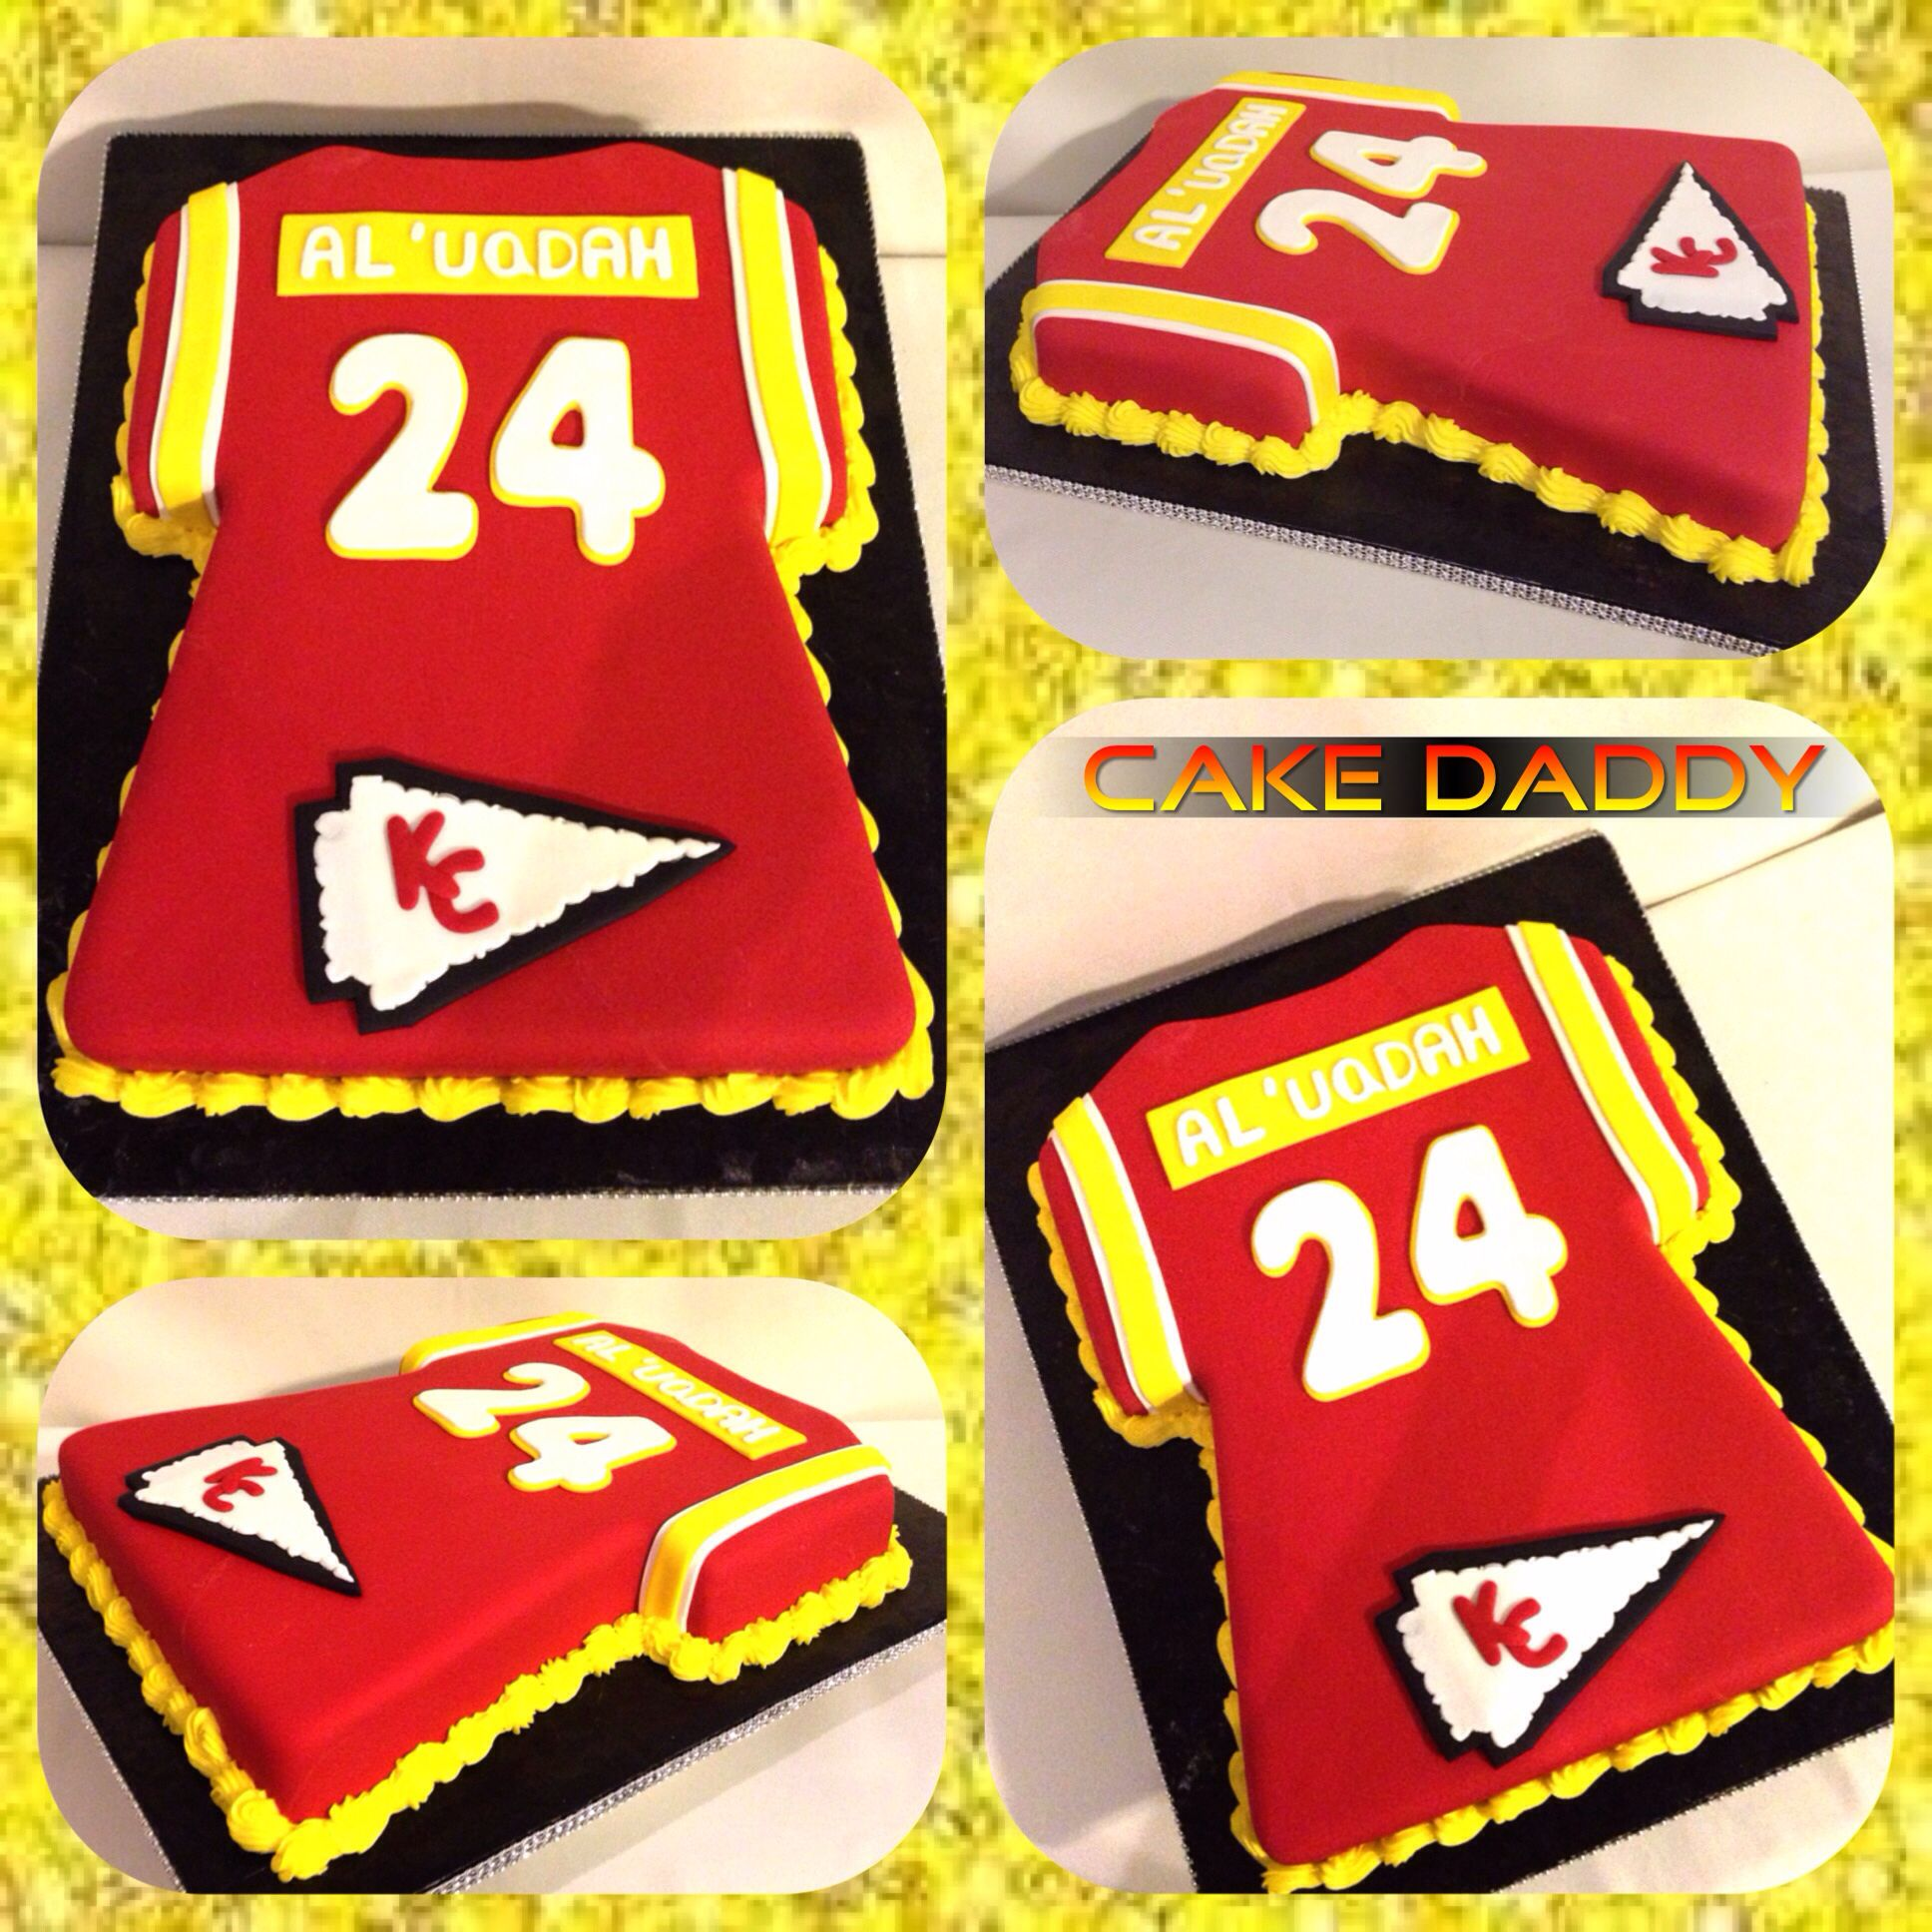 finest selection e1e4b 51273 Kansas City Chiefs jersey cake. | Custom Cakes by Cake Daddy ...